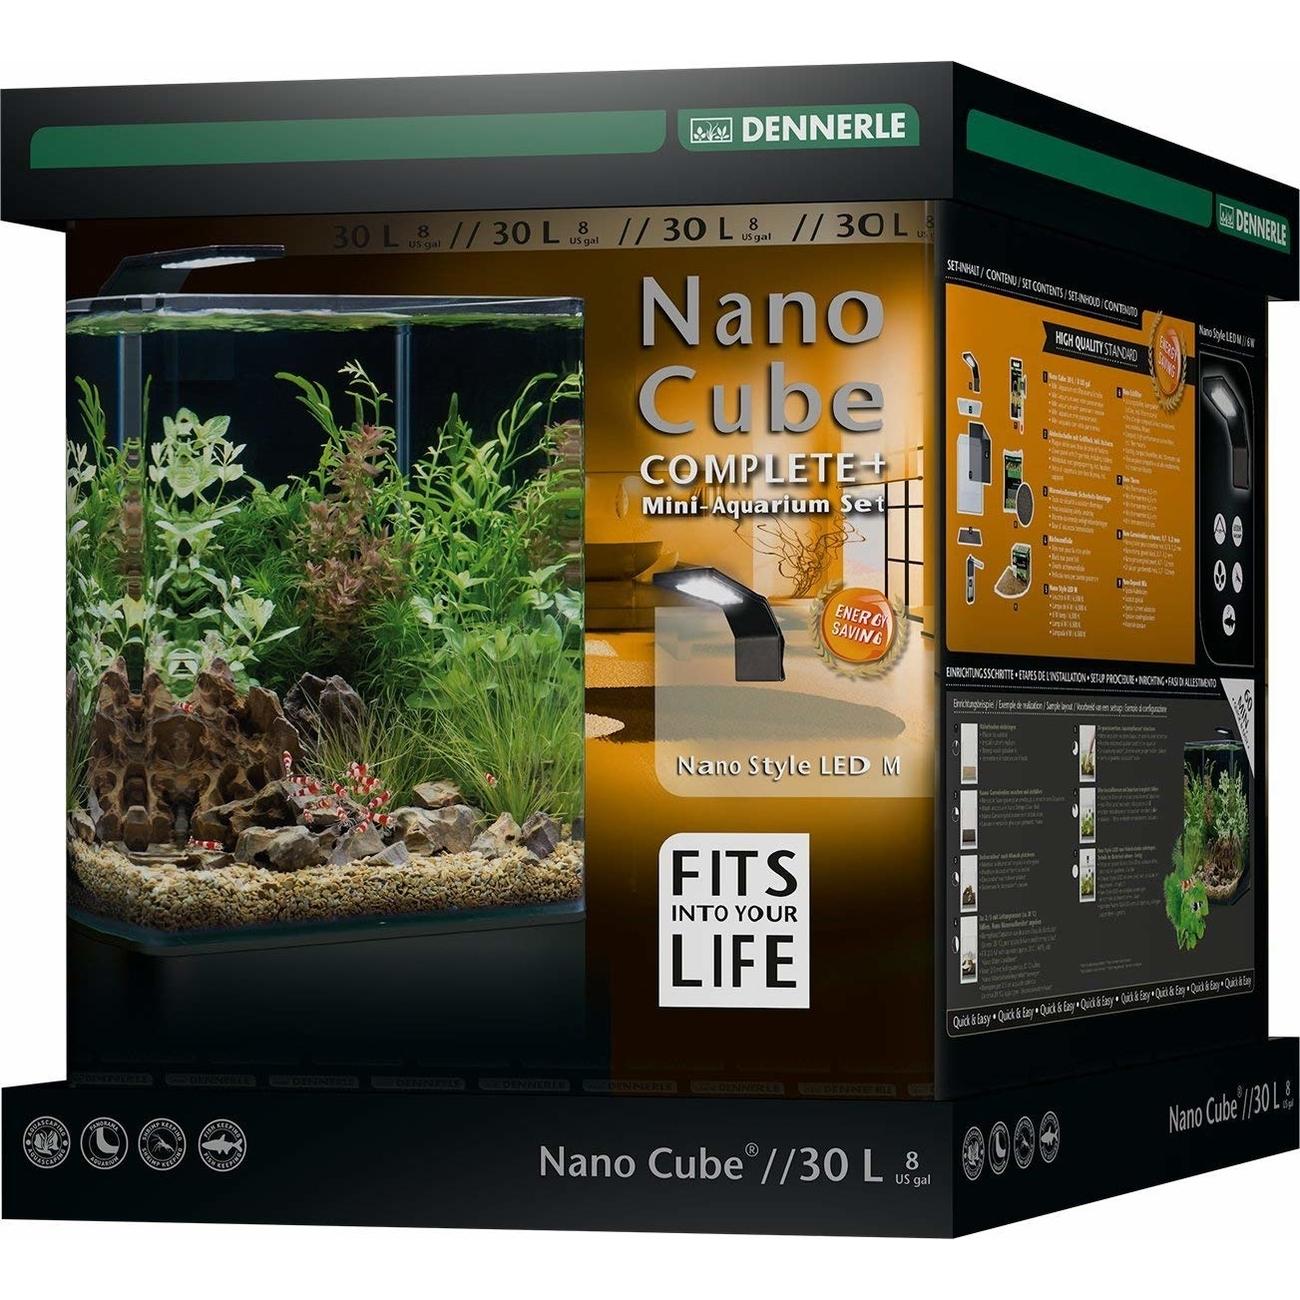 Dennerle NanoCube Complete+ Style LED Bild 7